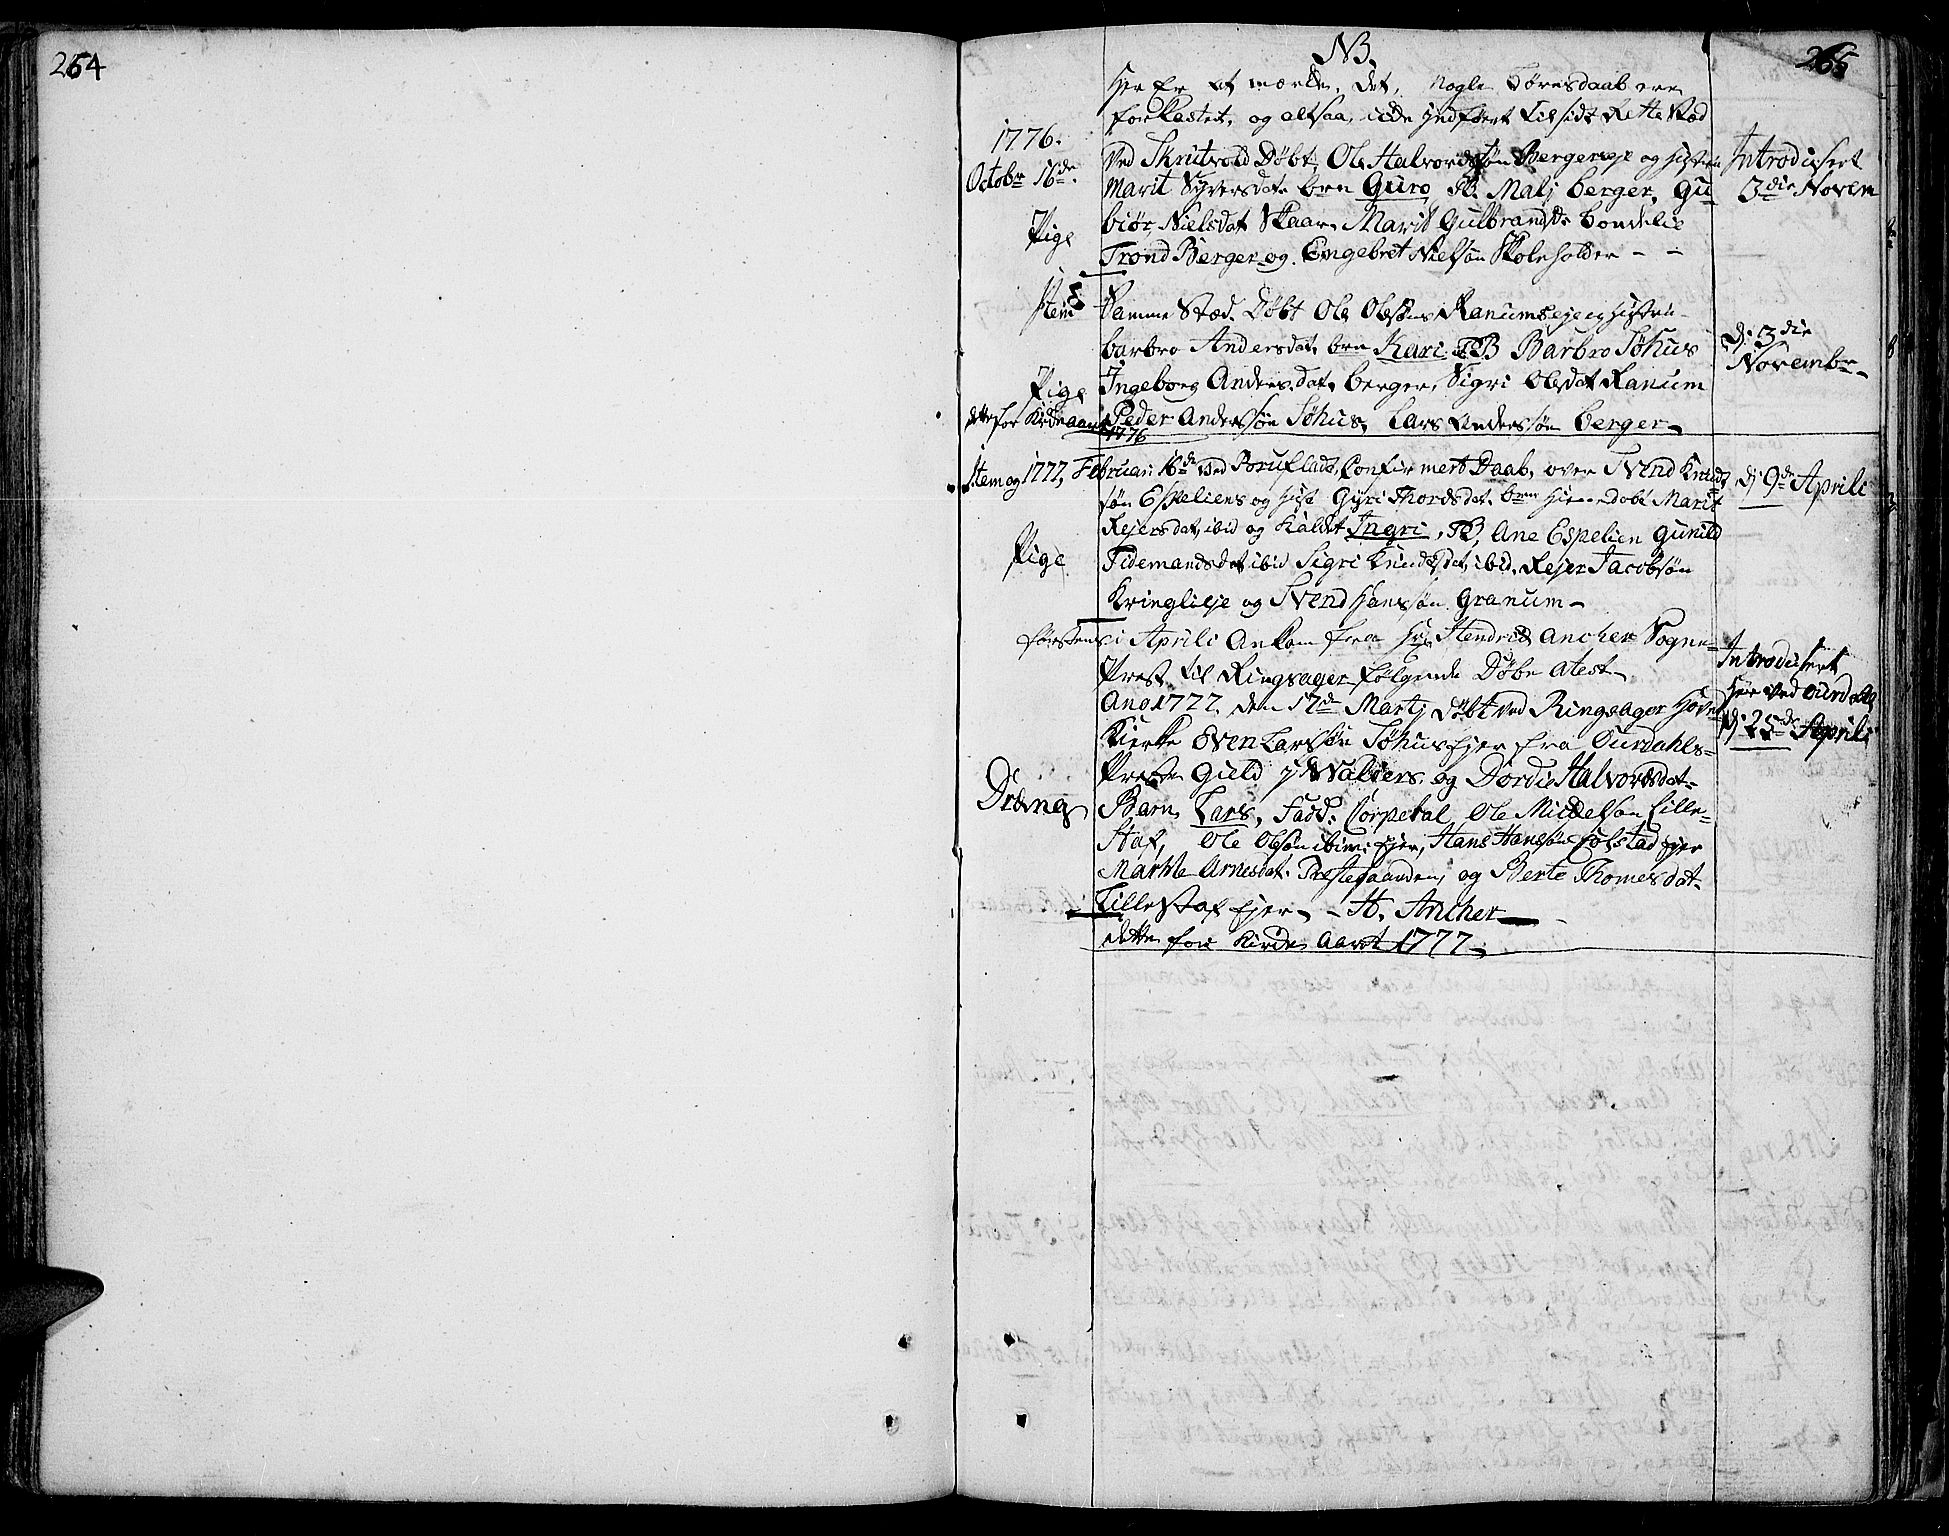 SAH, Aurdal prestekontor, Ministerialbok nr. 5, 1763-1781, s. 264-265